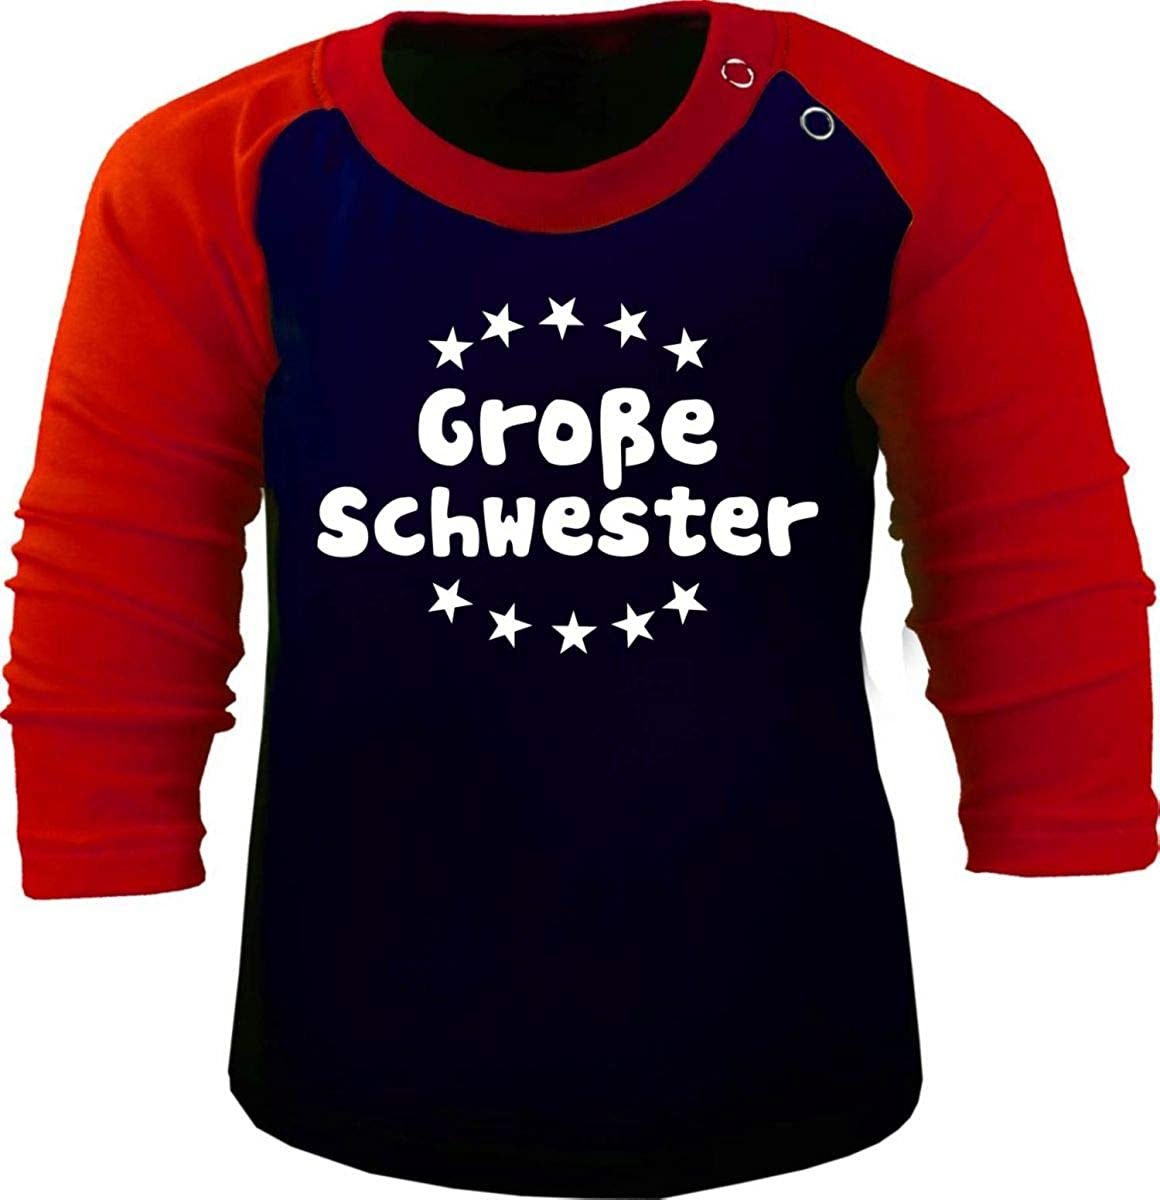 KLEINER FRATZ Baby//Kinder Baseball Langarm T-Shirt Gro/ße Schwester